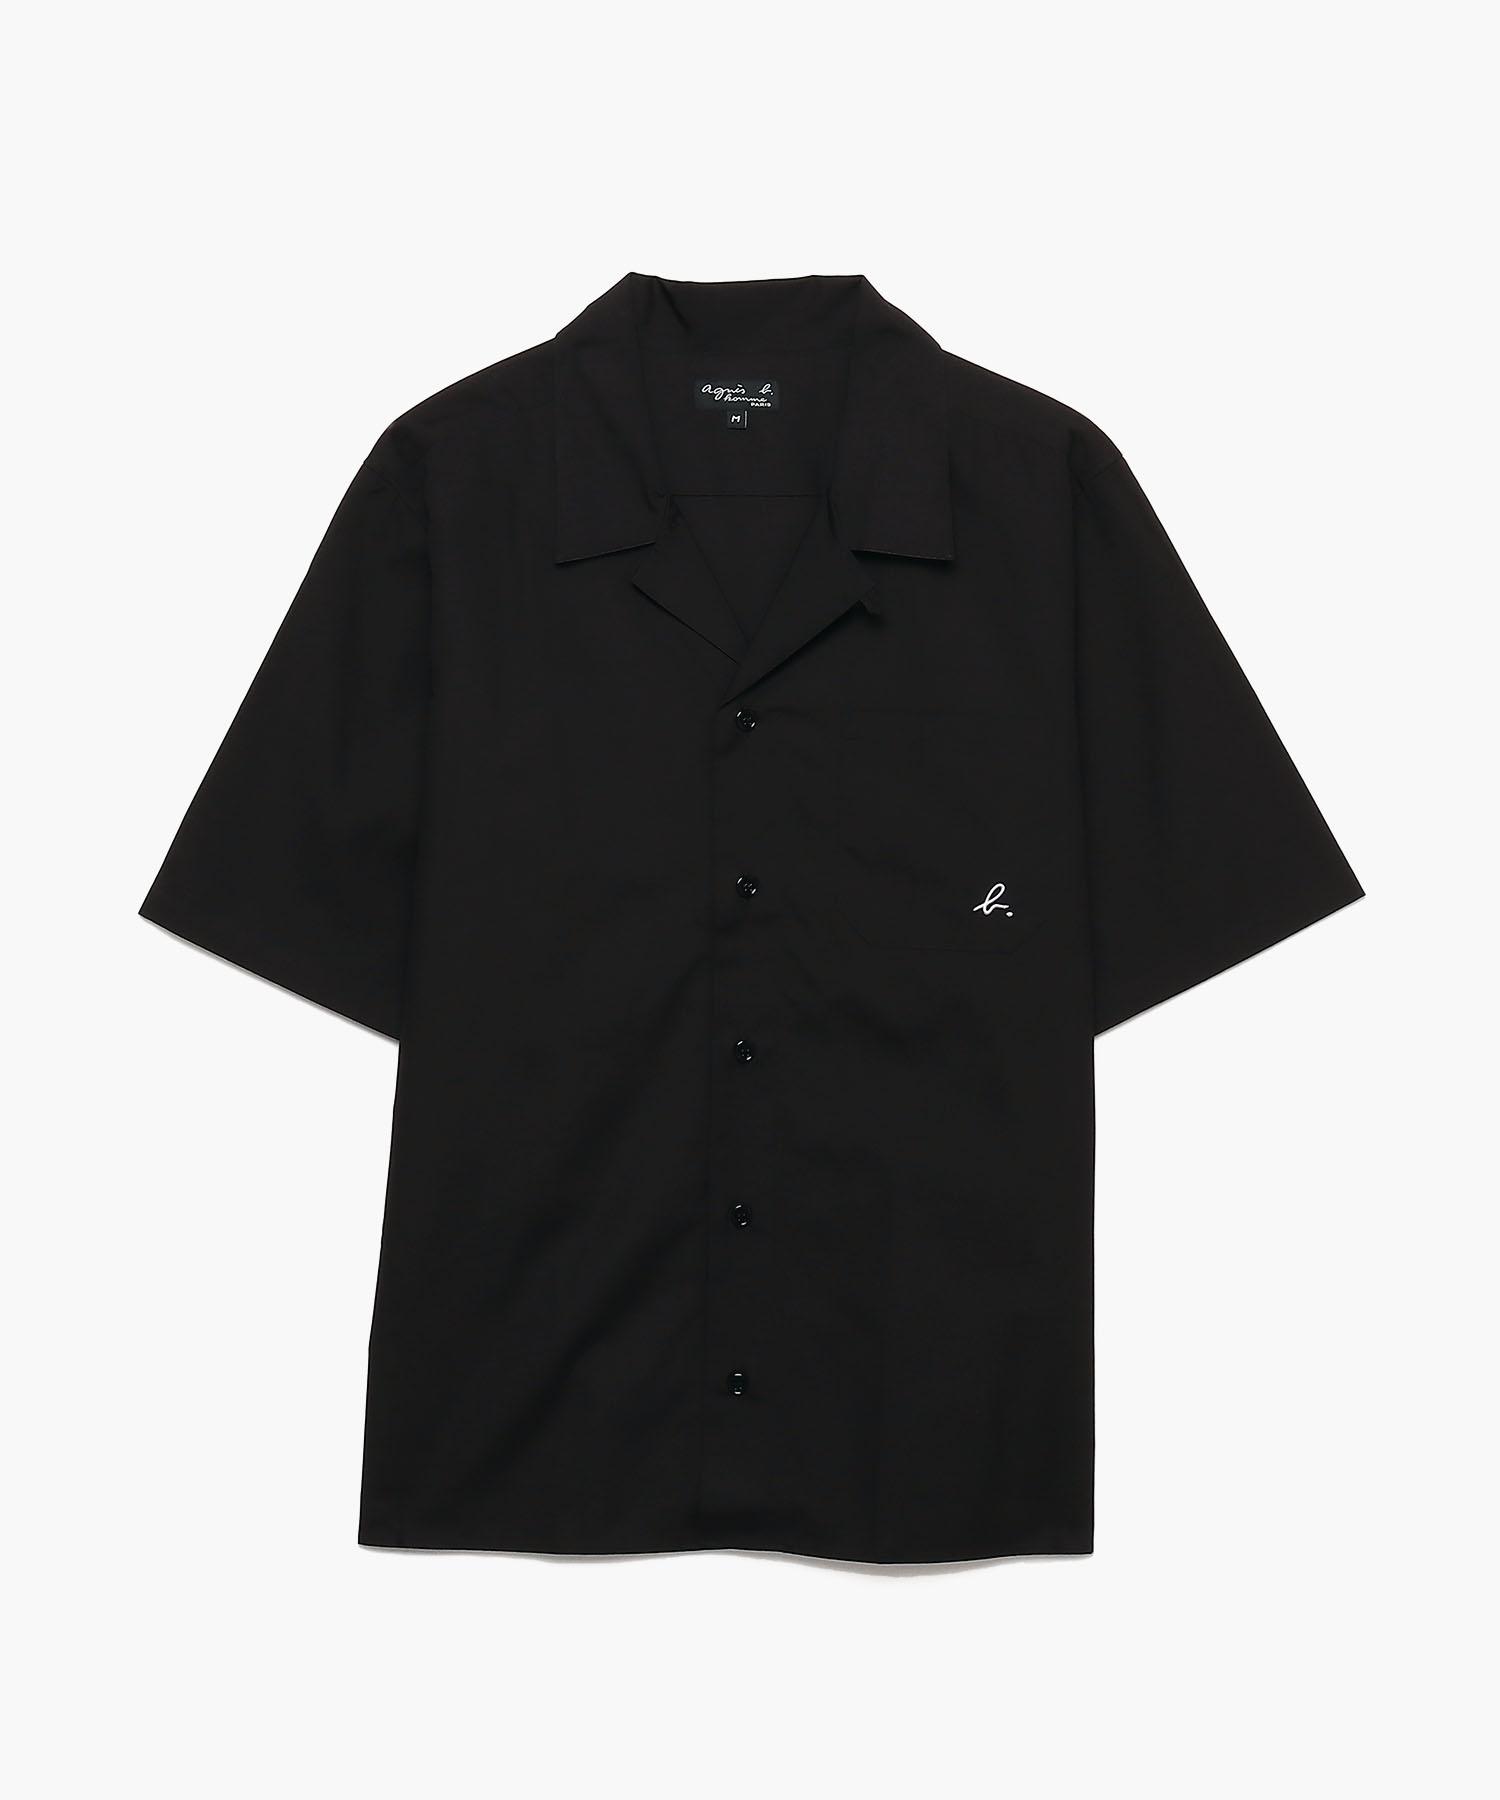 【WEB限定】UQ25 CHEMISE オープンカラーシャツ